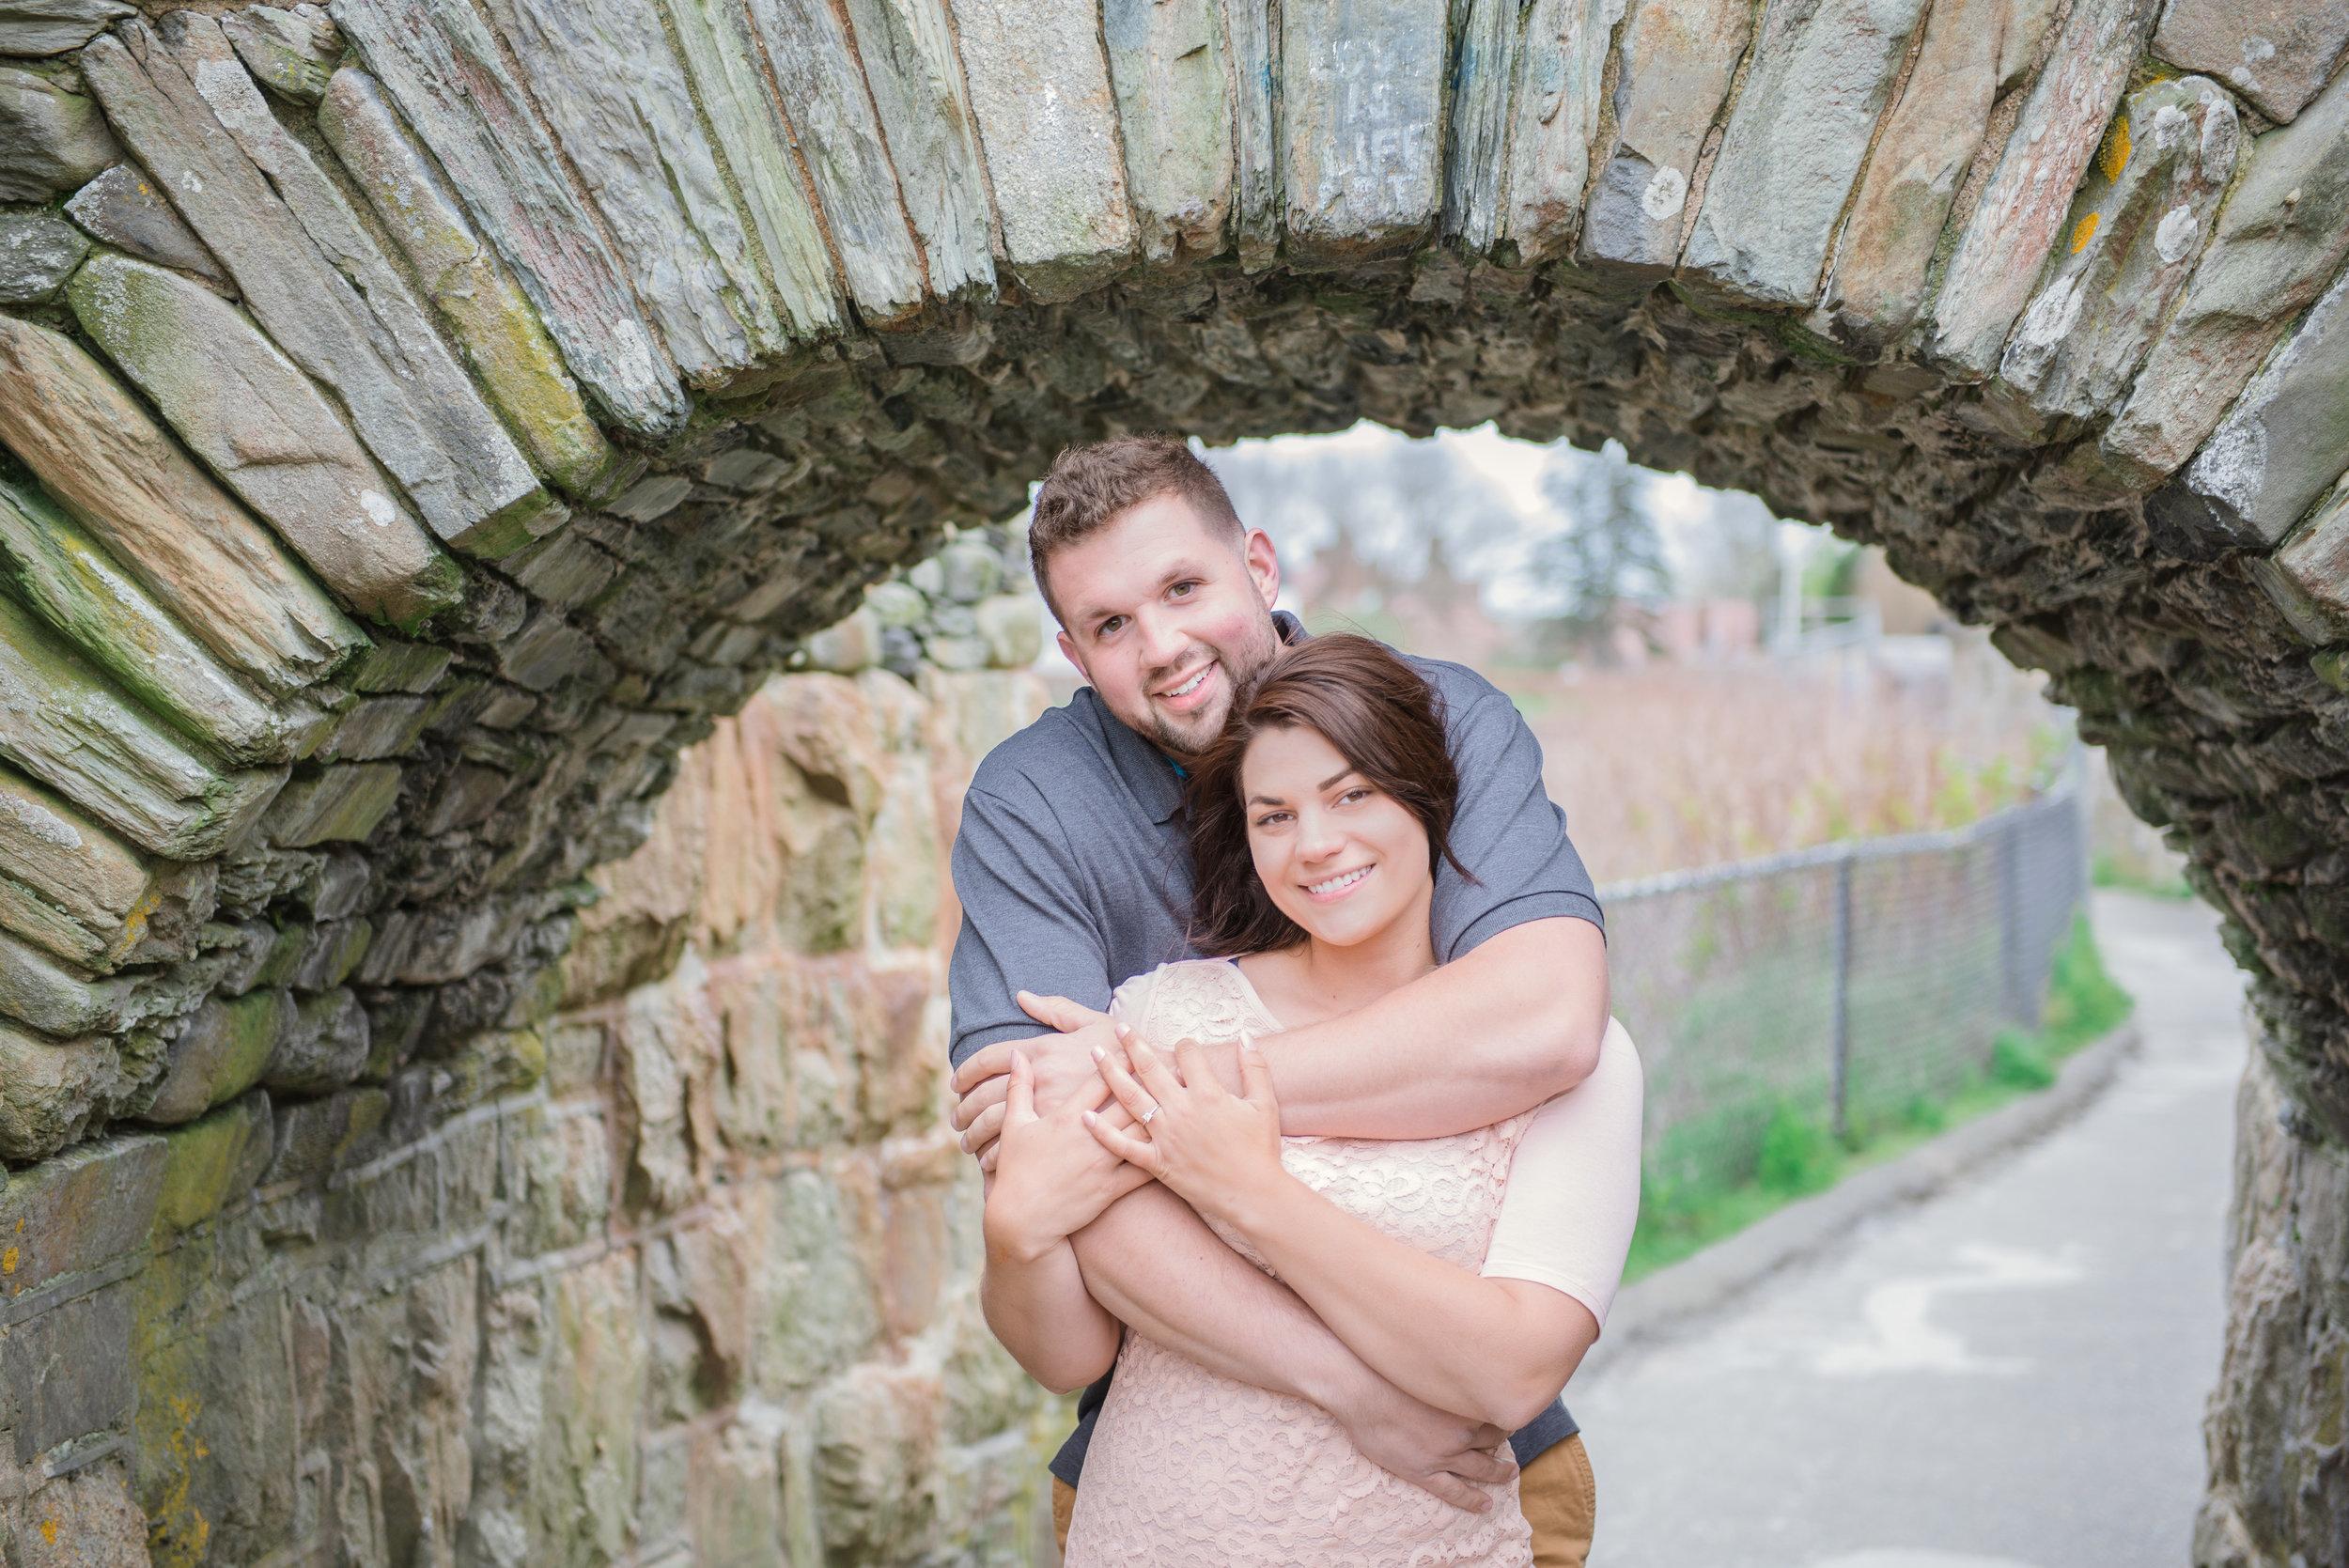 Aurora_and_Tim_Engaged-16.jpg